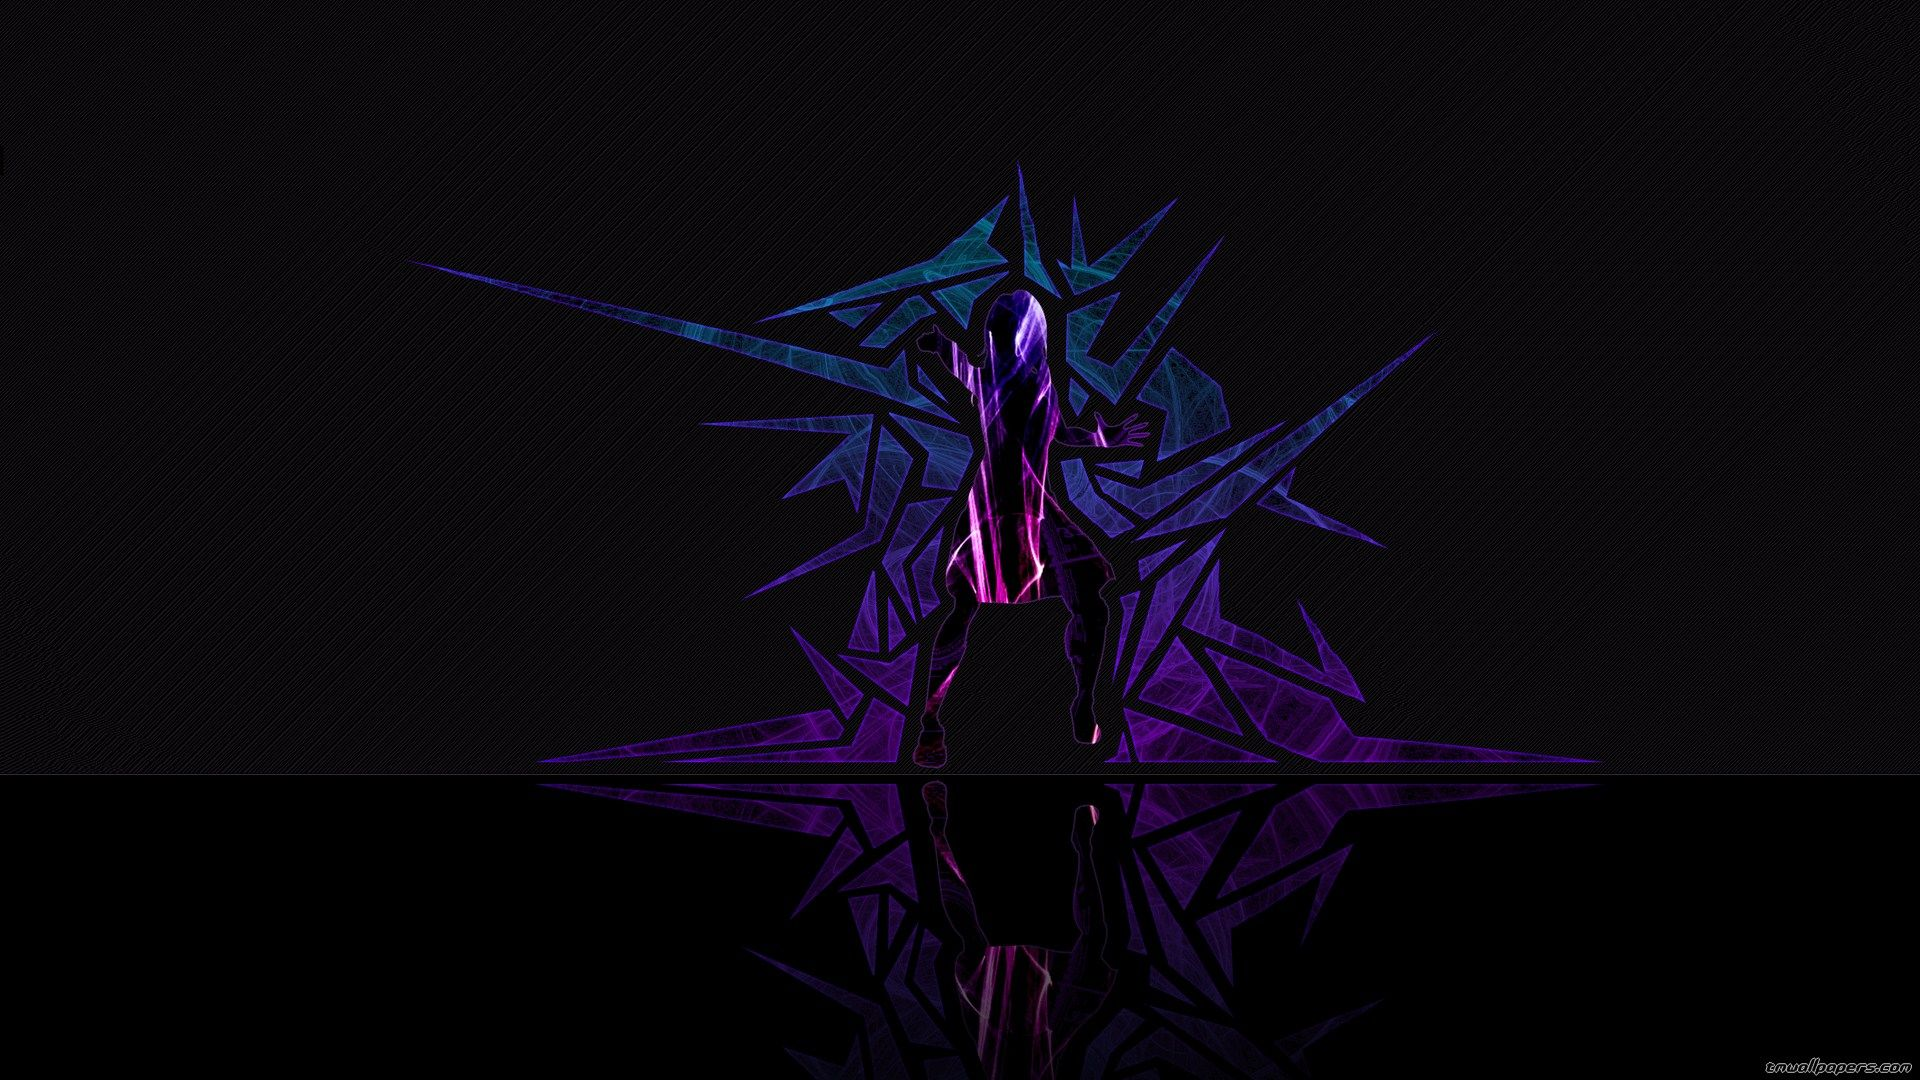 Dark Abstract Wallpapers Top Free Dark Abstract